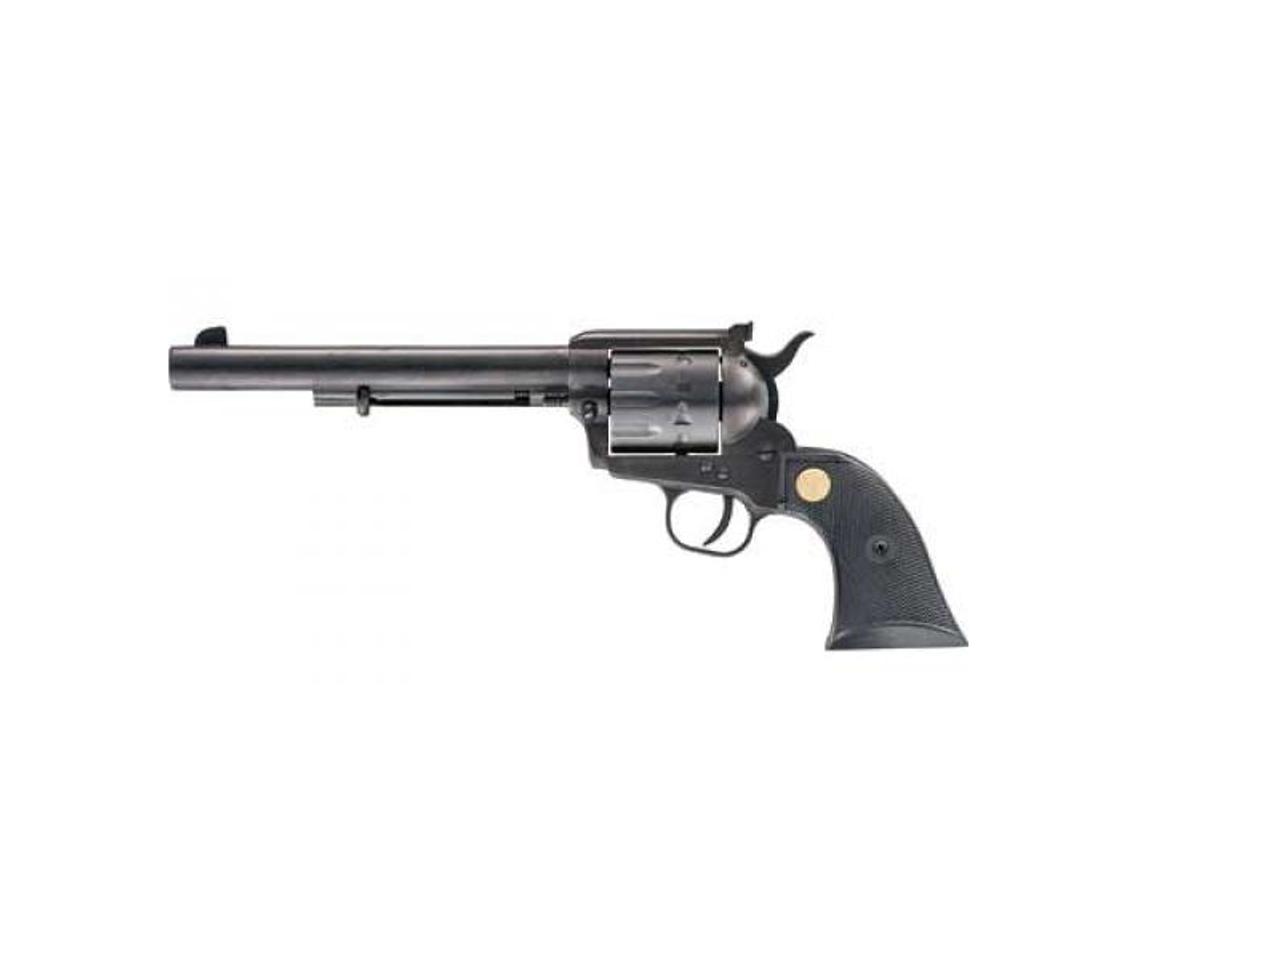 Chiappa Firearms Chiappa Saa Target 22-10 7.5